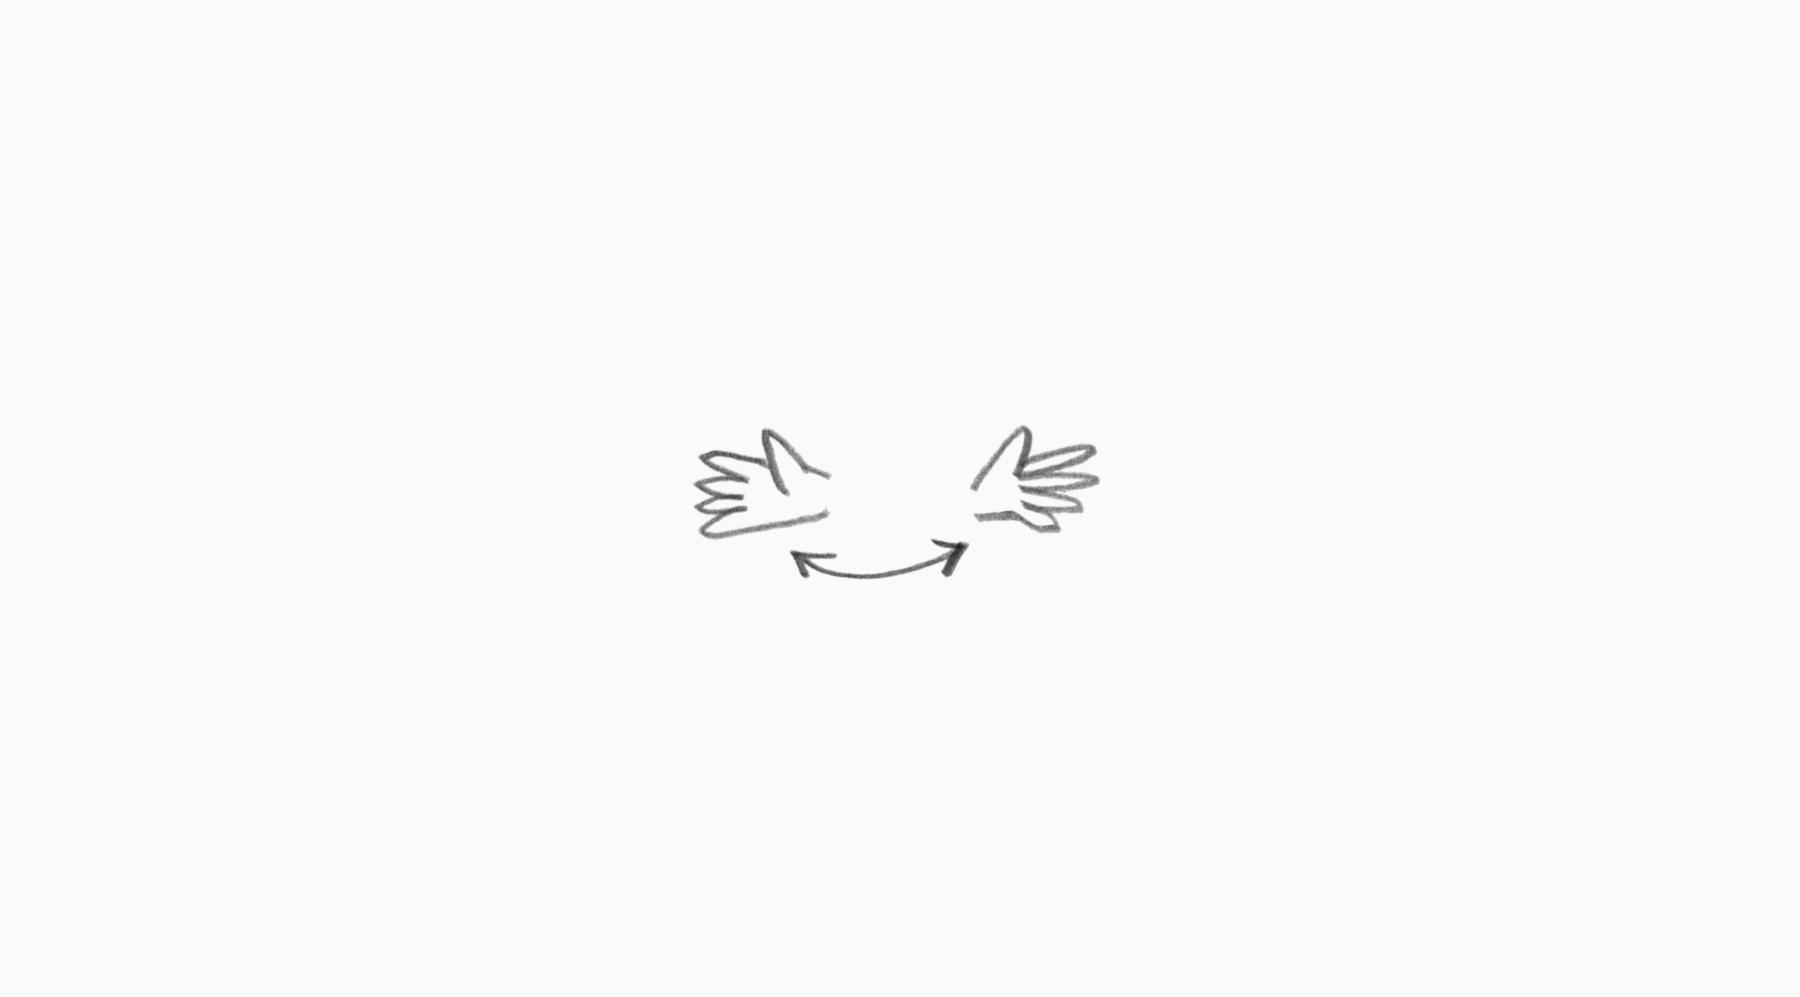 DCM Illustrationen Animation